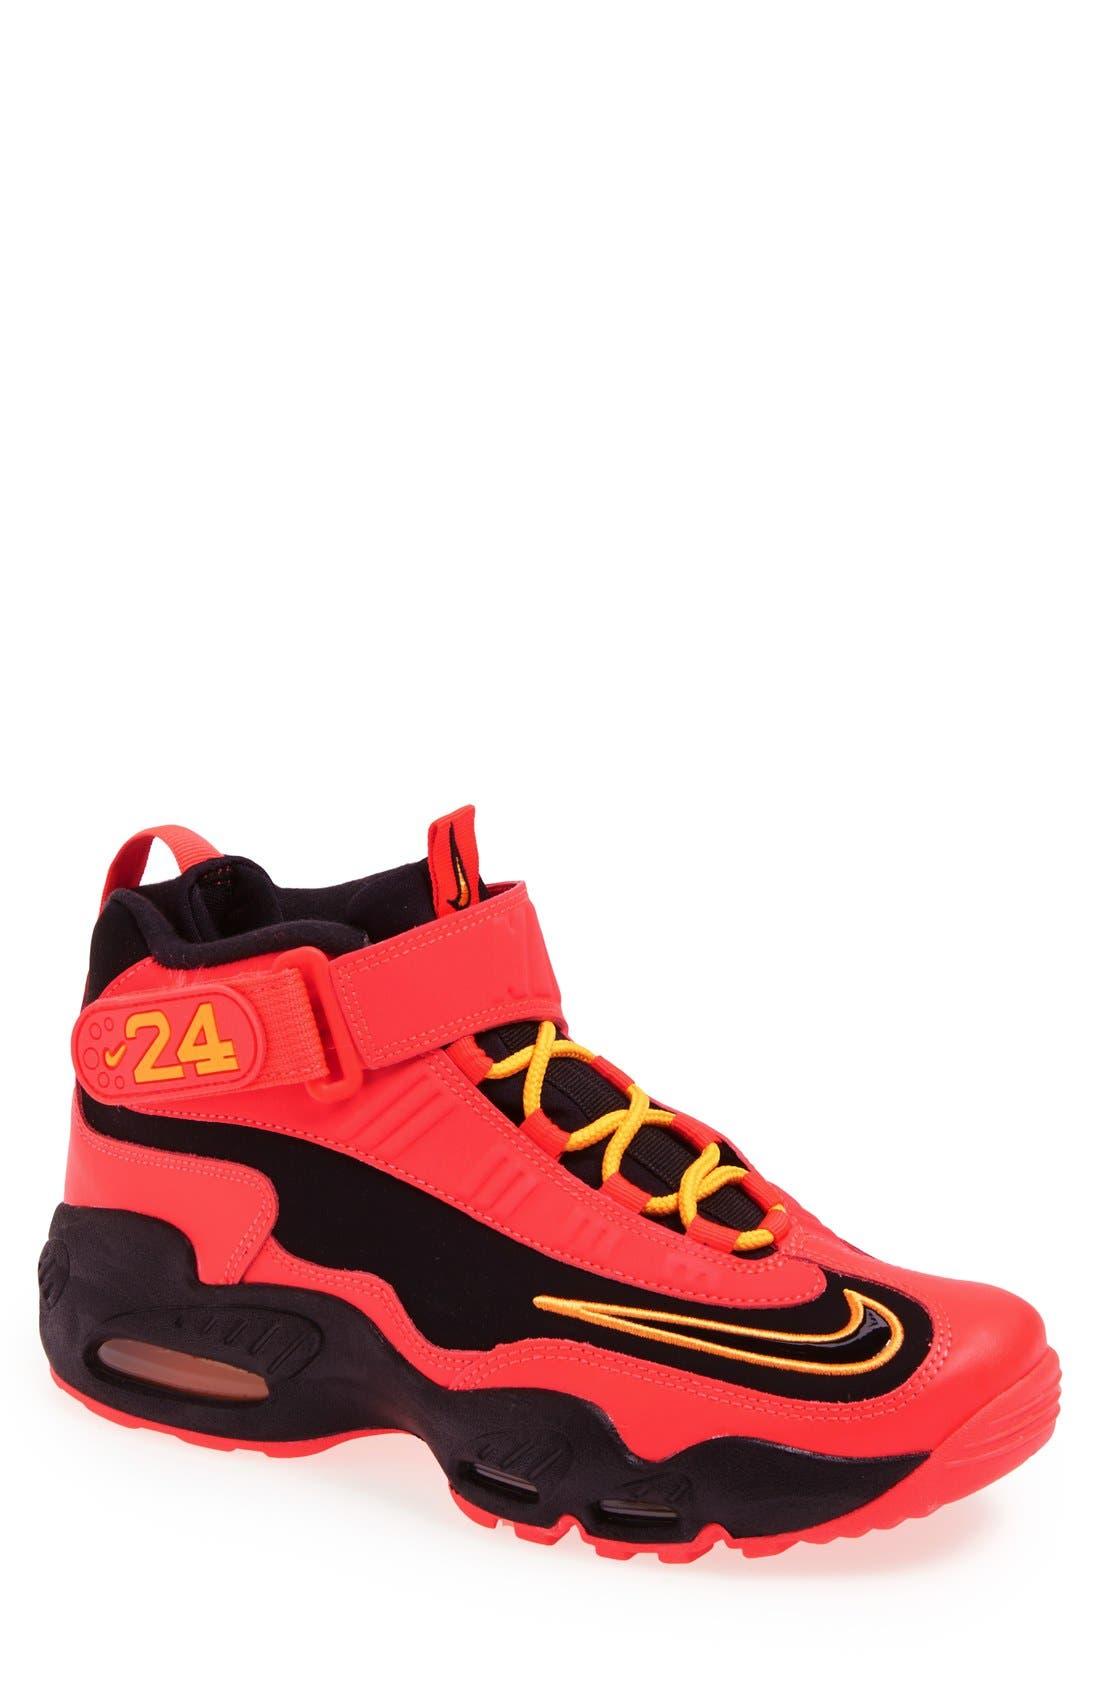 Alternate Image 1 Selected - Nike 'Air Griffey Max 1' Sneaker (Men)